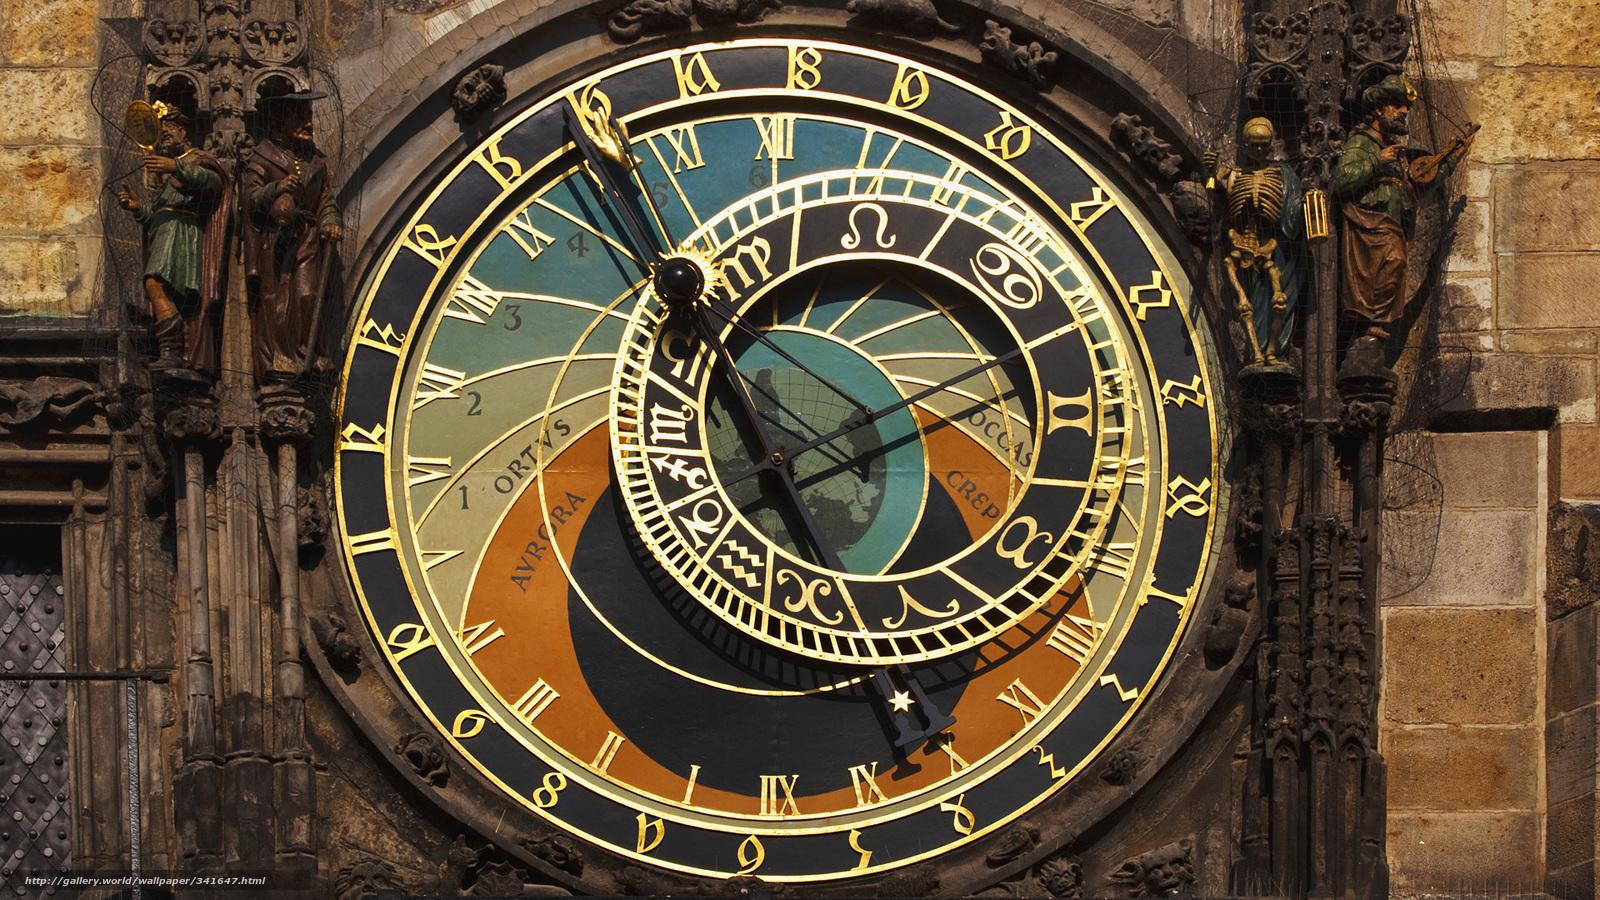 Download wallpaper watch,  astronomy,  czech republic,  Prague free desktop wallpaper in the resolution 1920x1080 — picture №341647